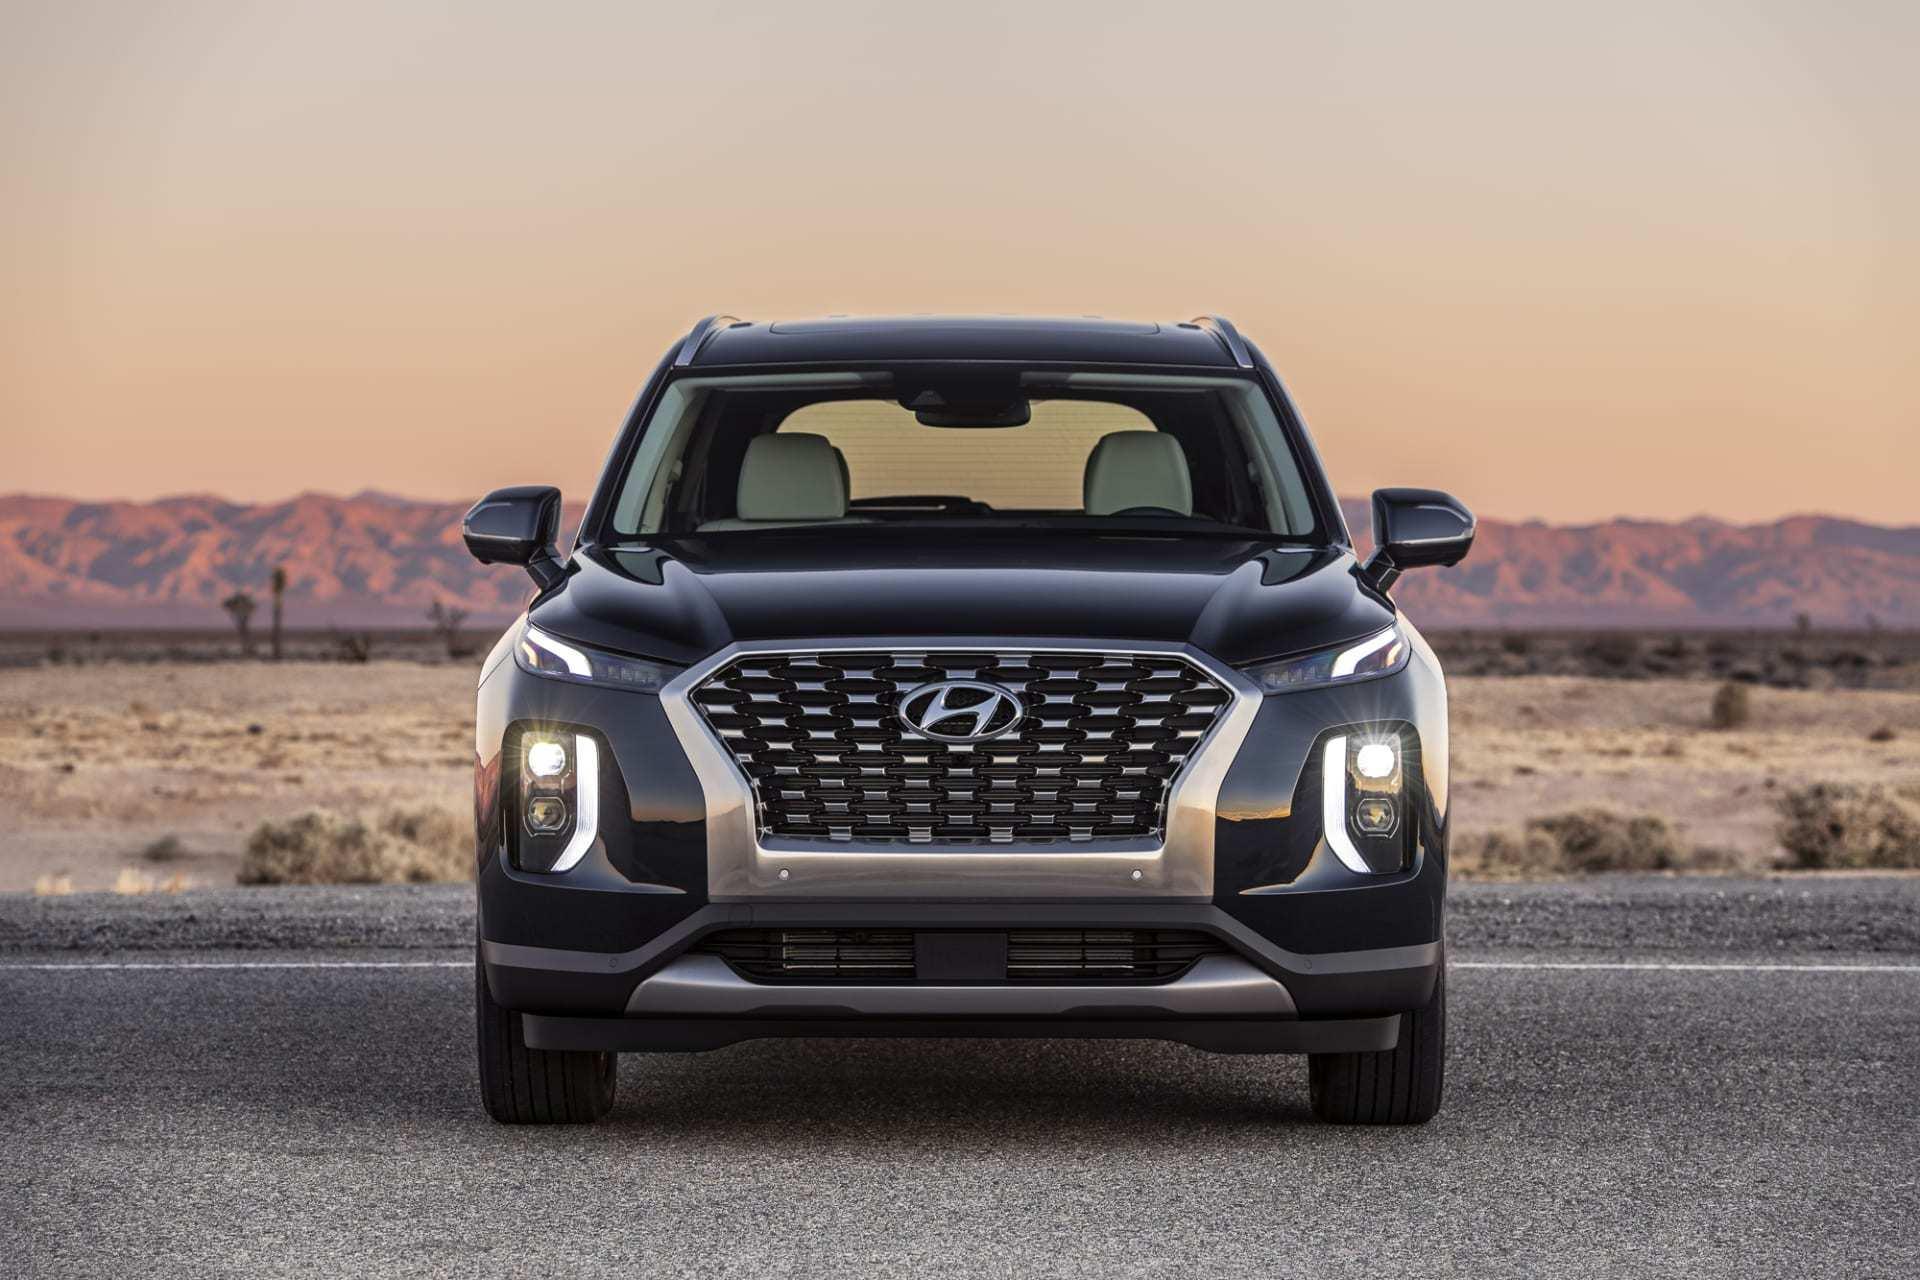 78 New Hyundai Lineup 2020 Speed Test by Hyundai Lineup 2020